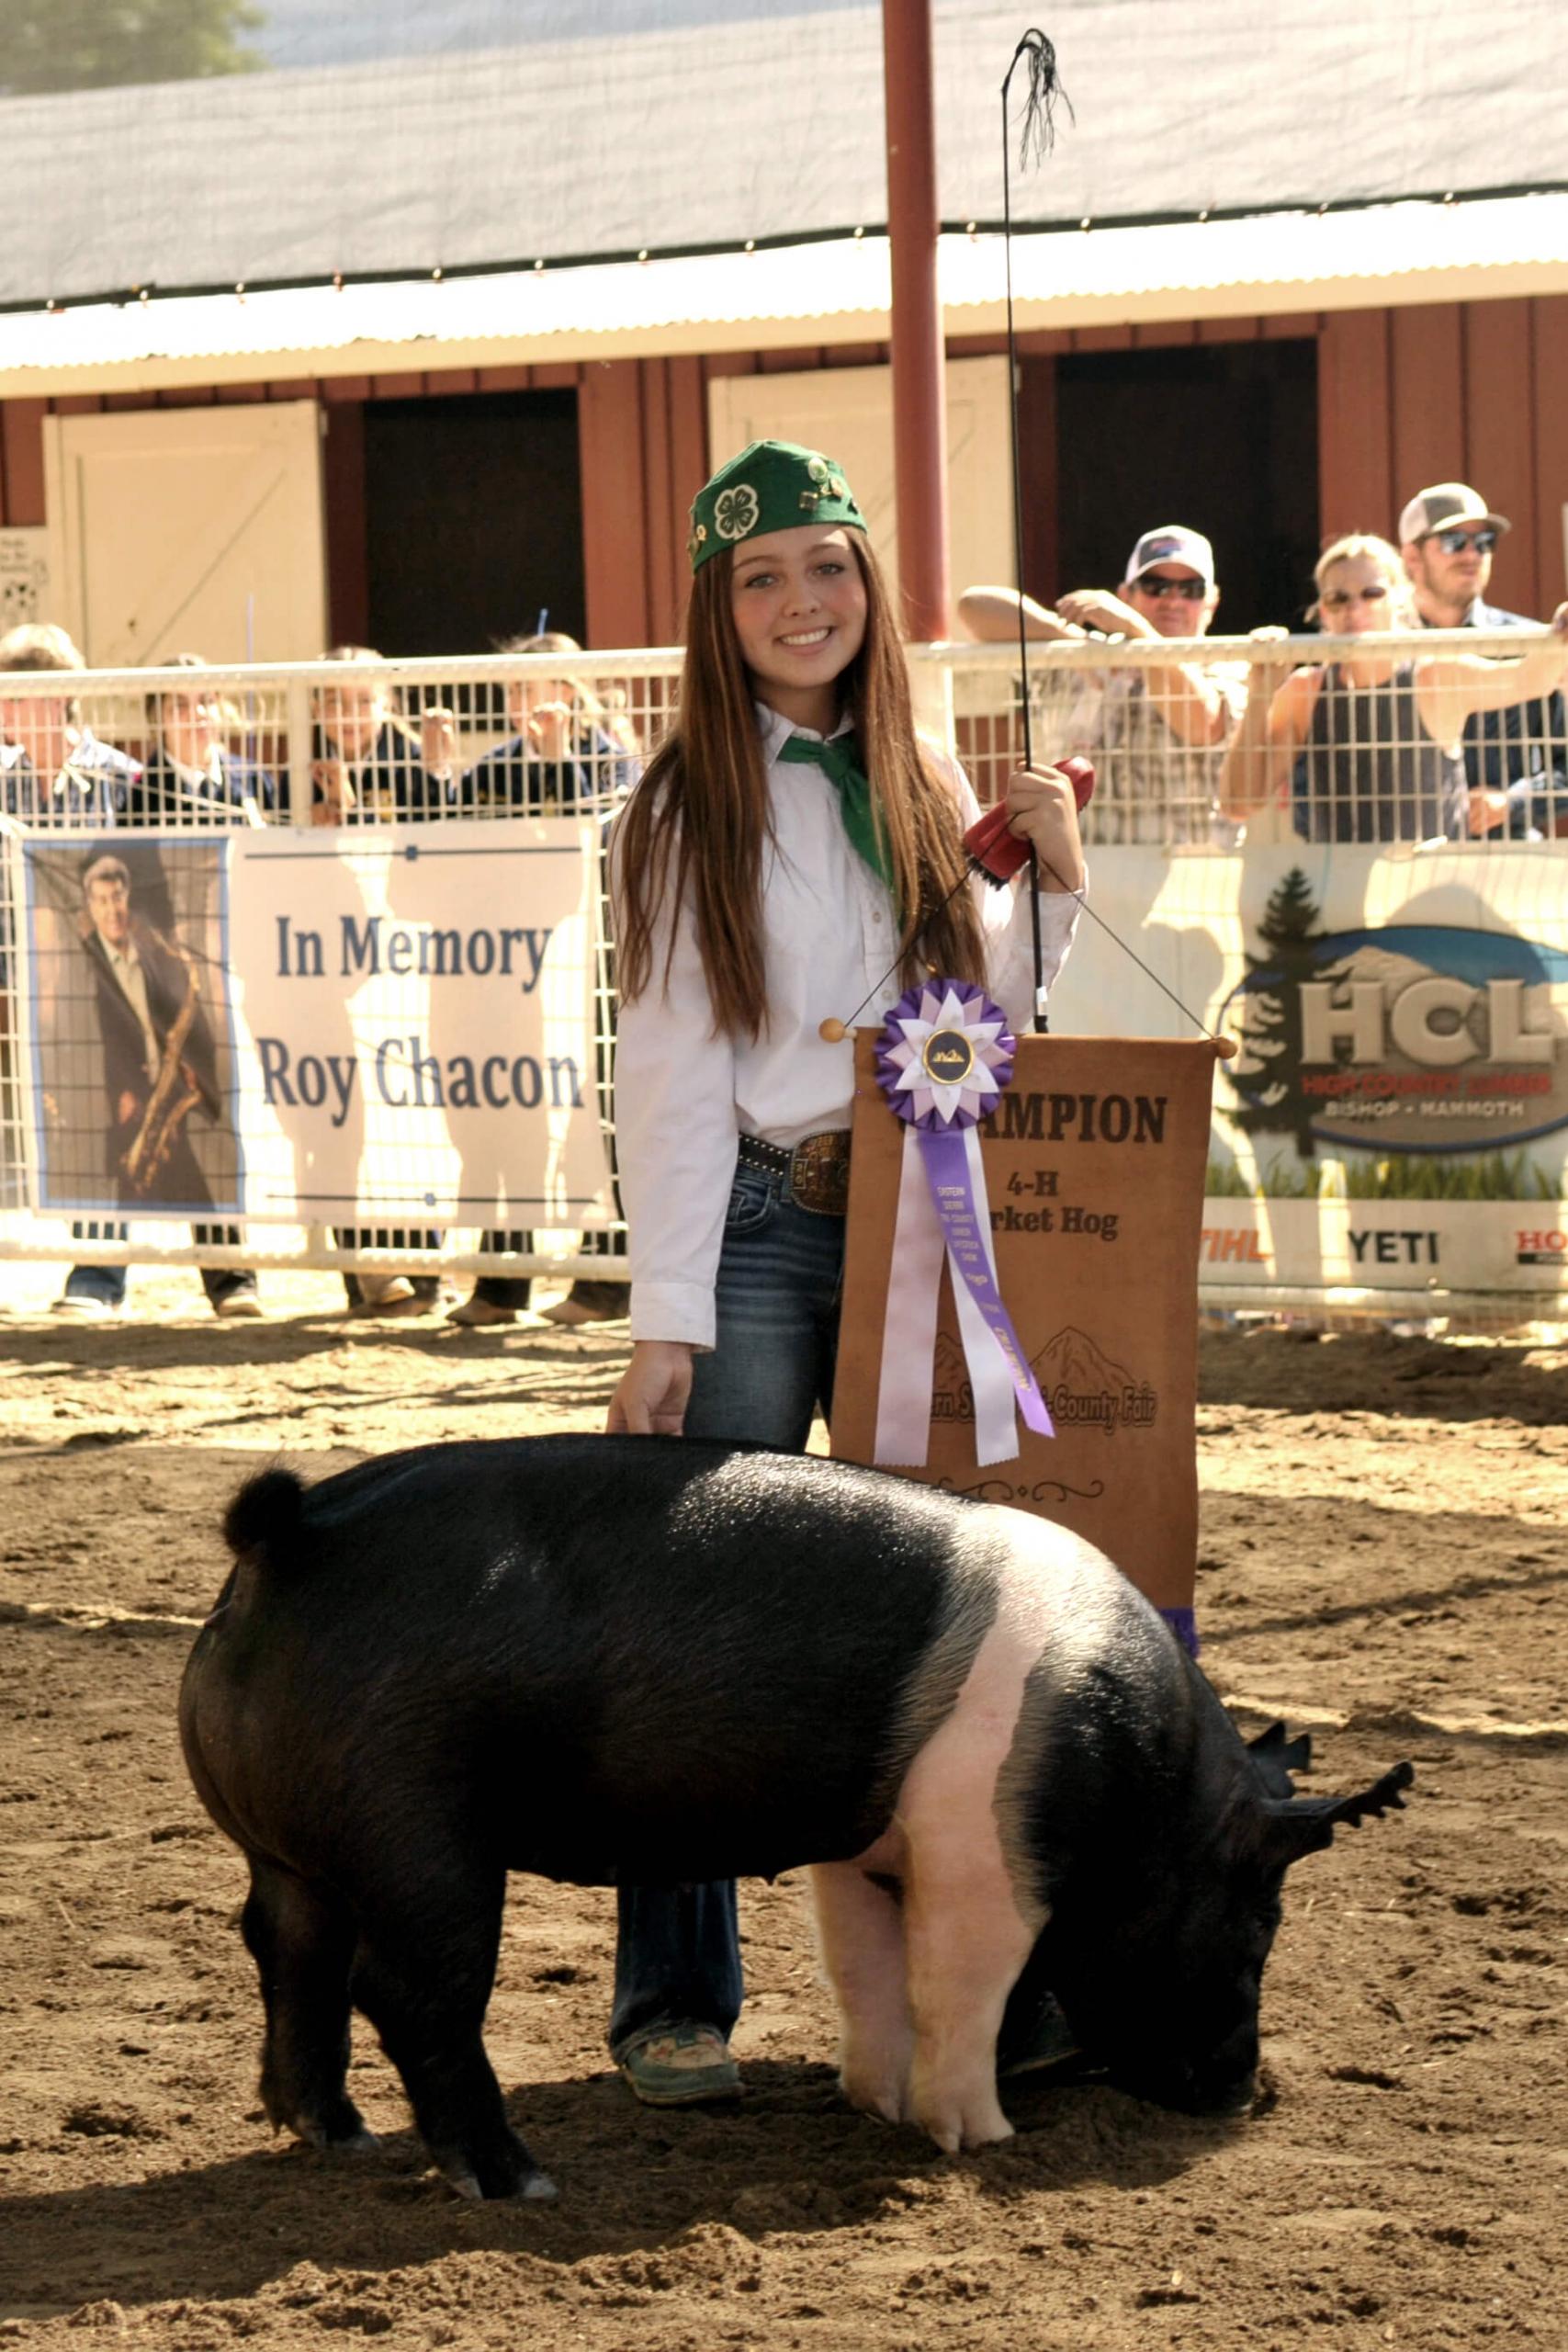 Gillian Urton - Reserve Champ Hog